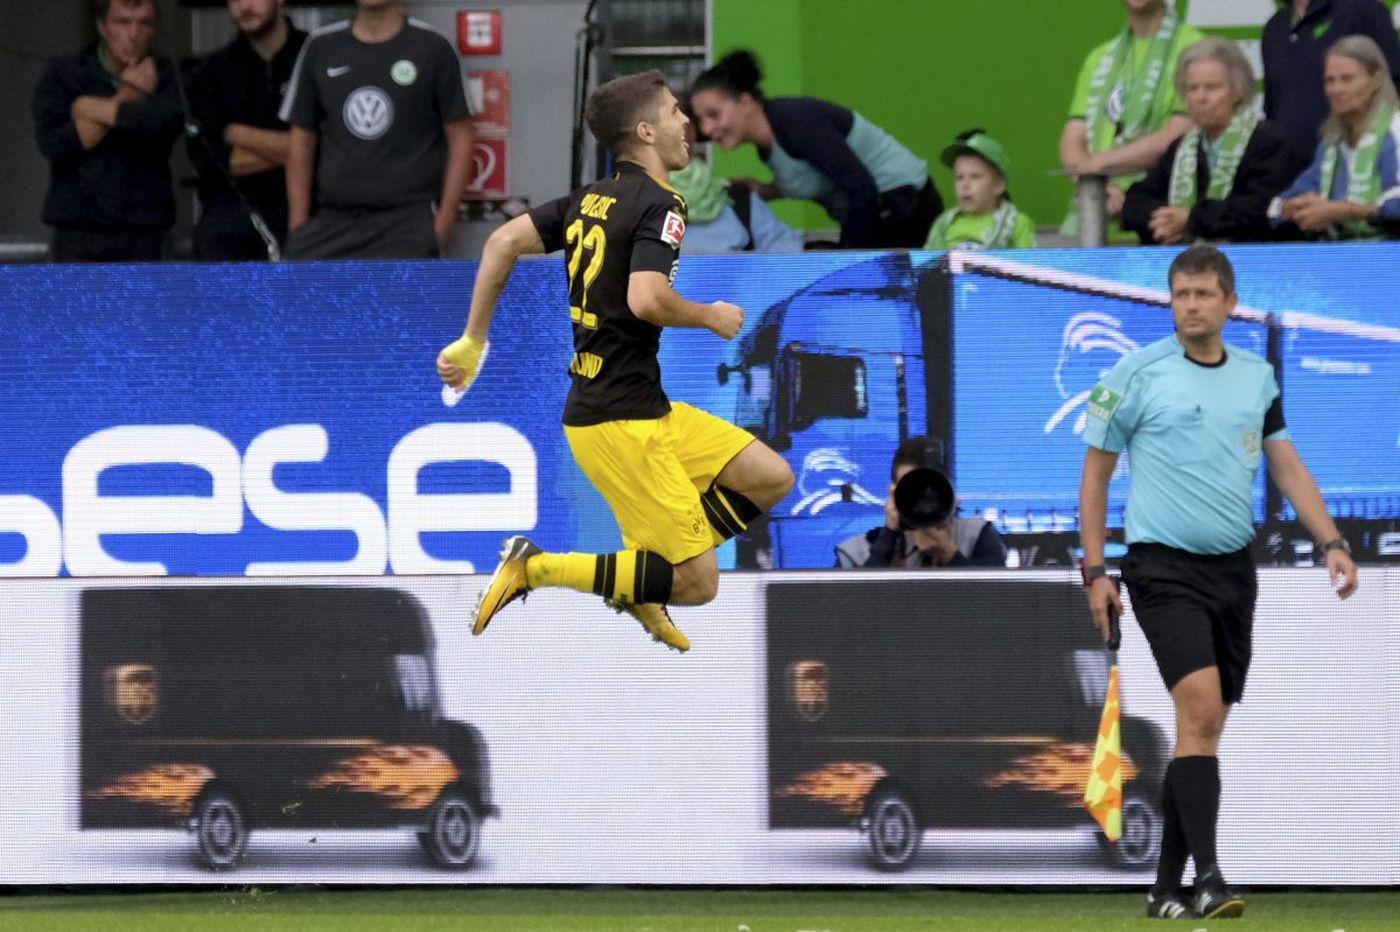 Watch: Christian Pulisic scored a great goal for Borussia Dortmund at Hamburg